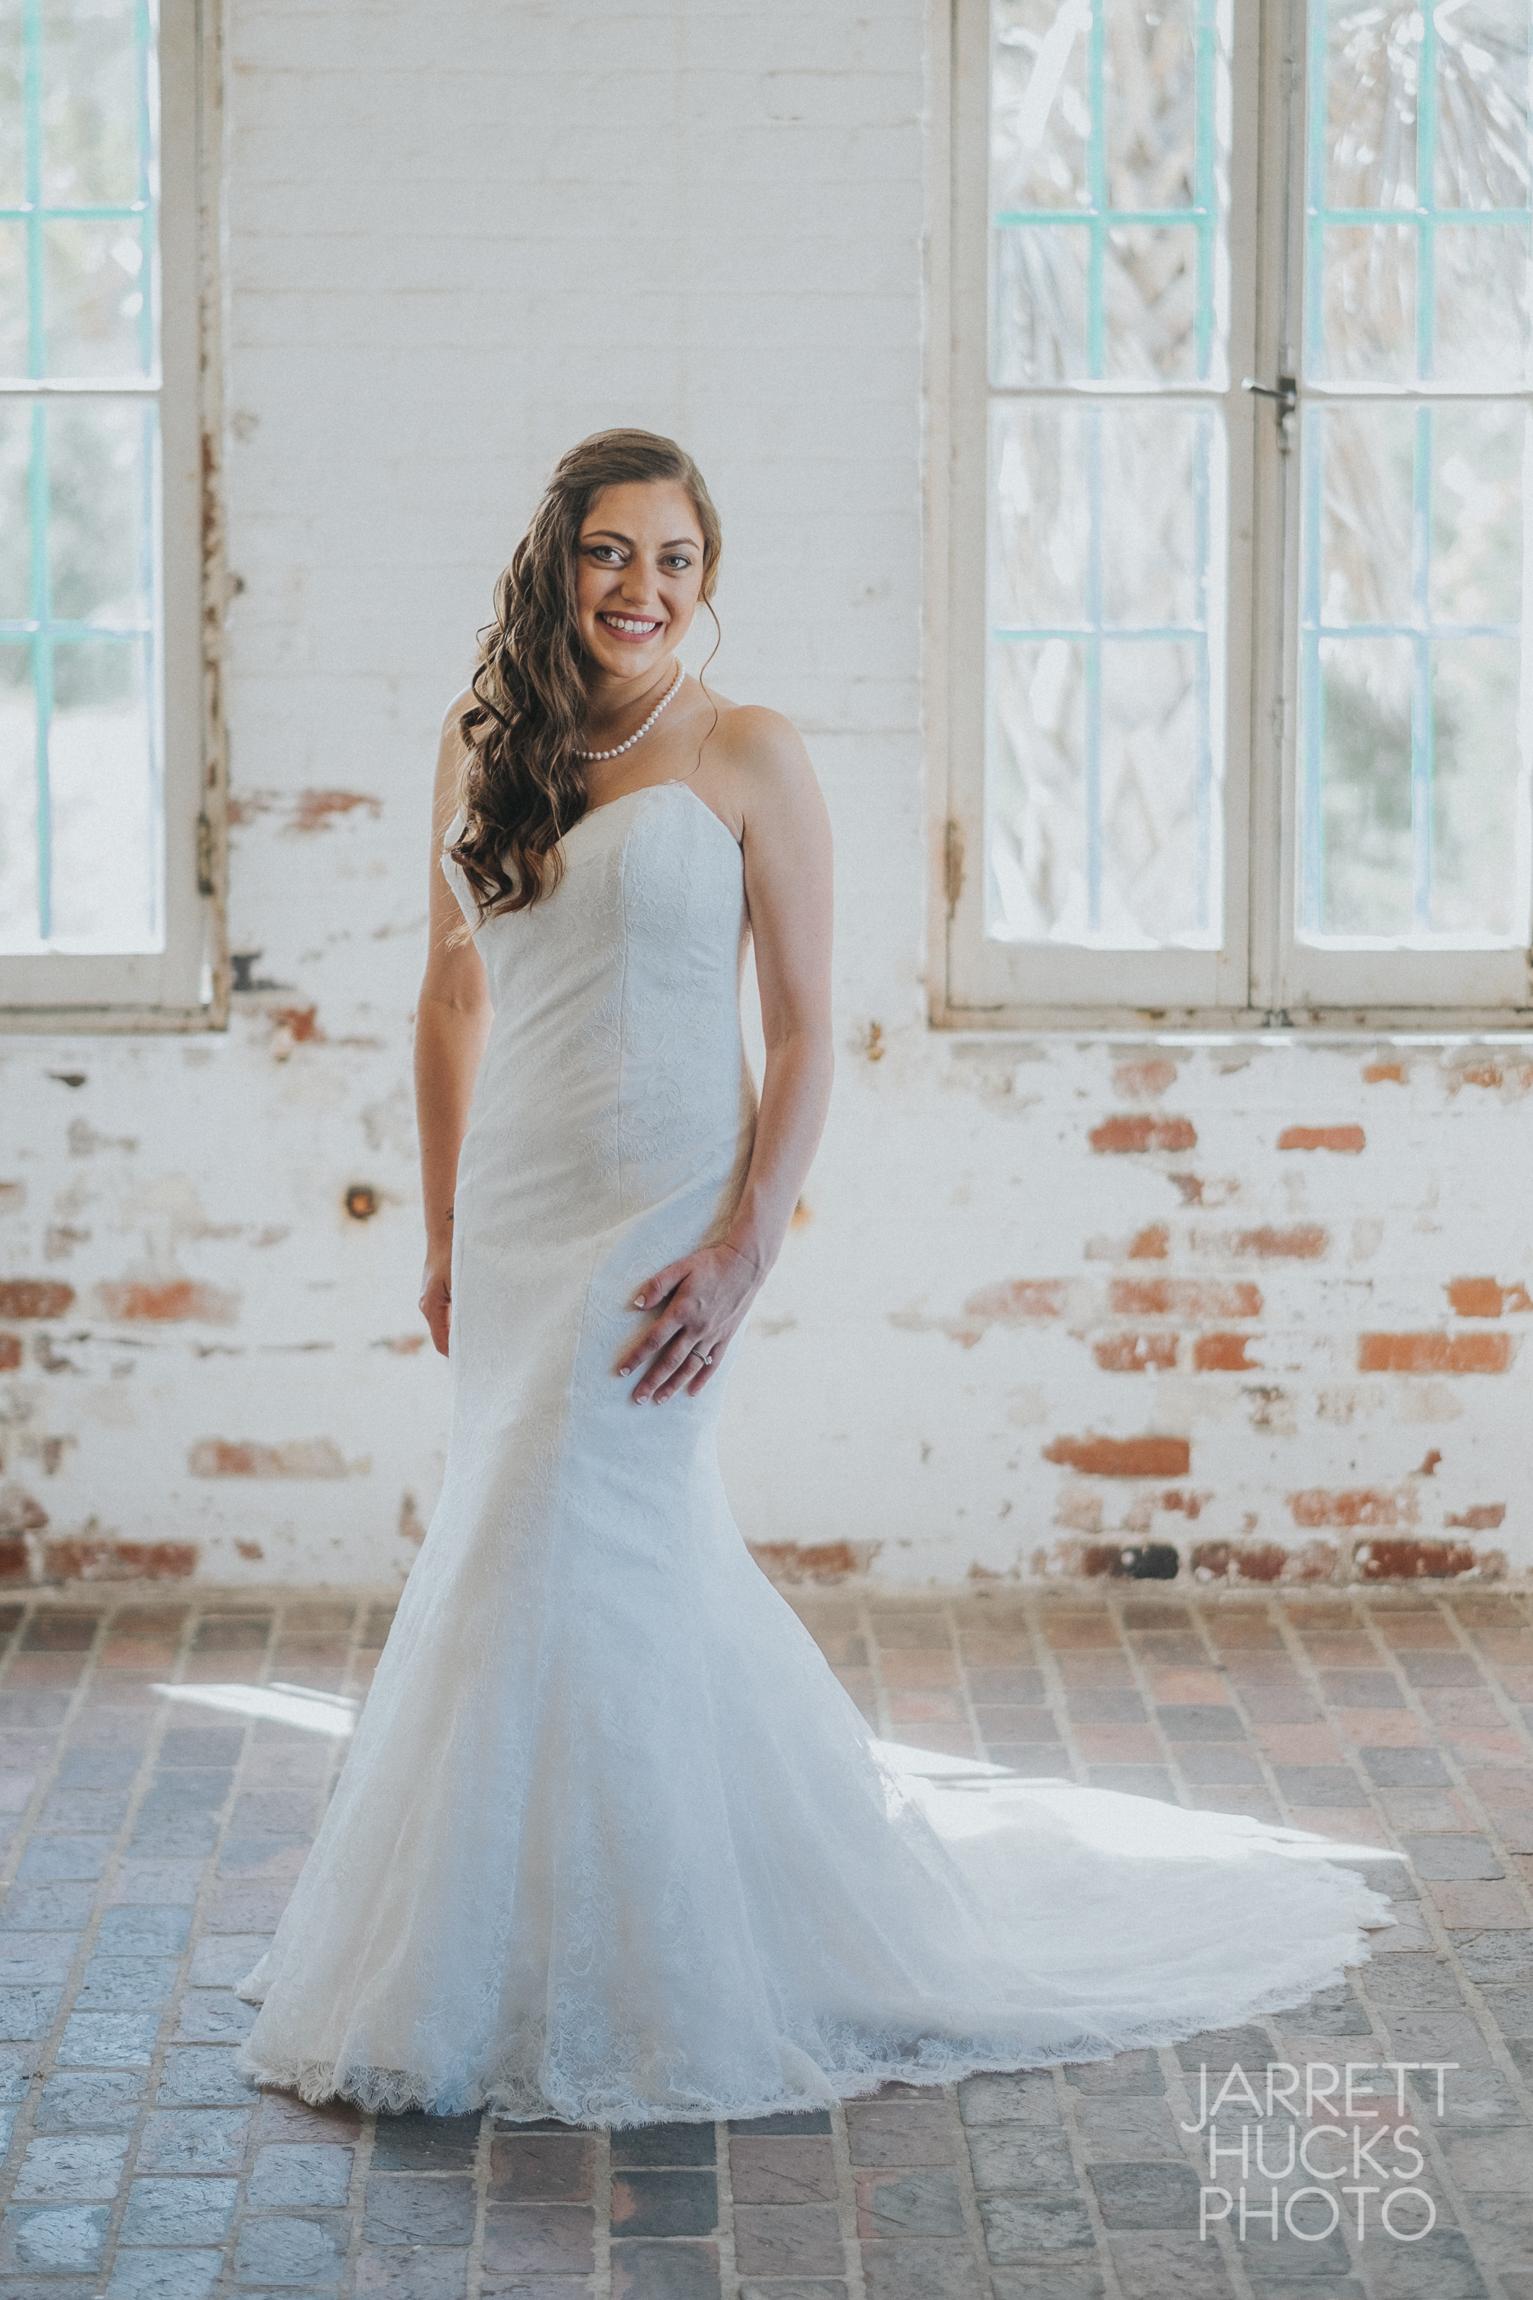 Nikki bridal-1.jpg